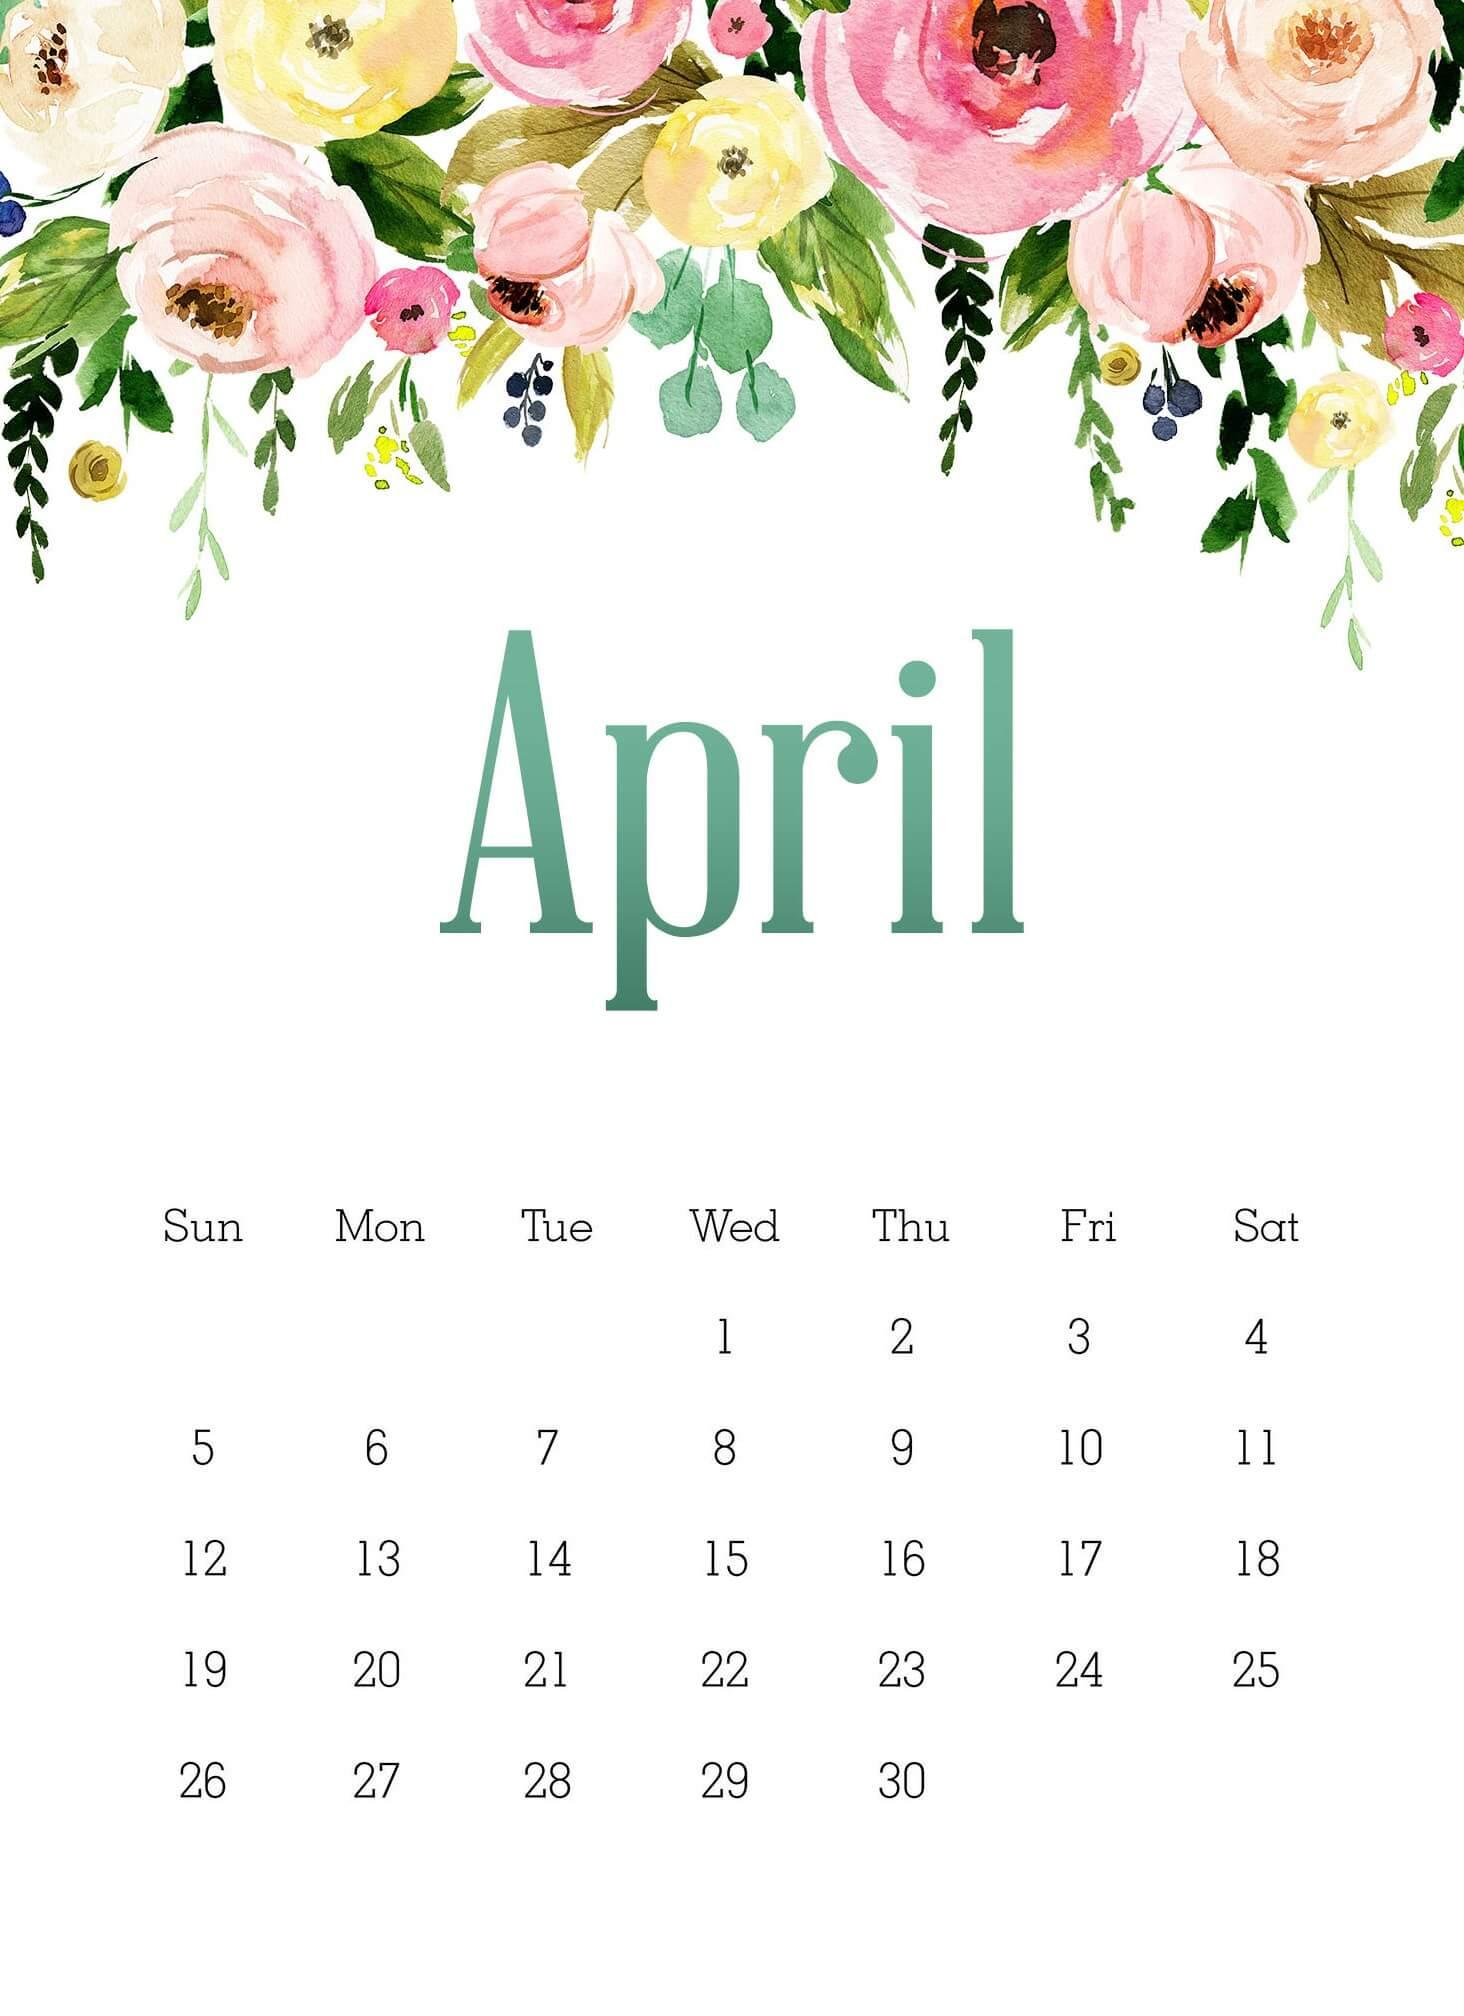 April 2020 Calendar Wallpapers   HD Background Images ...